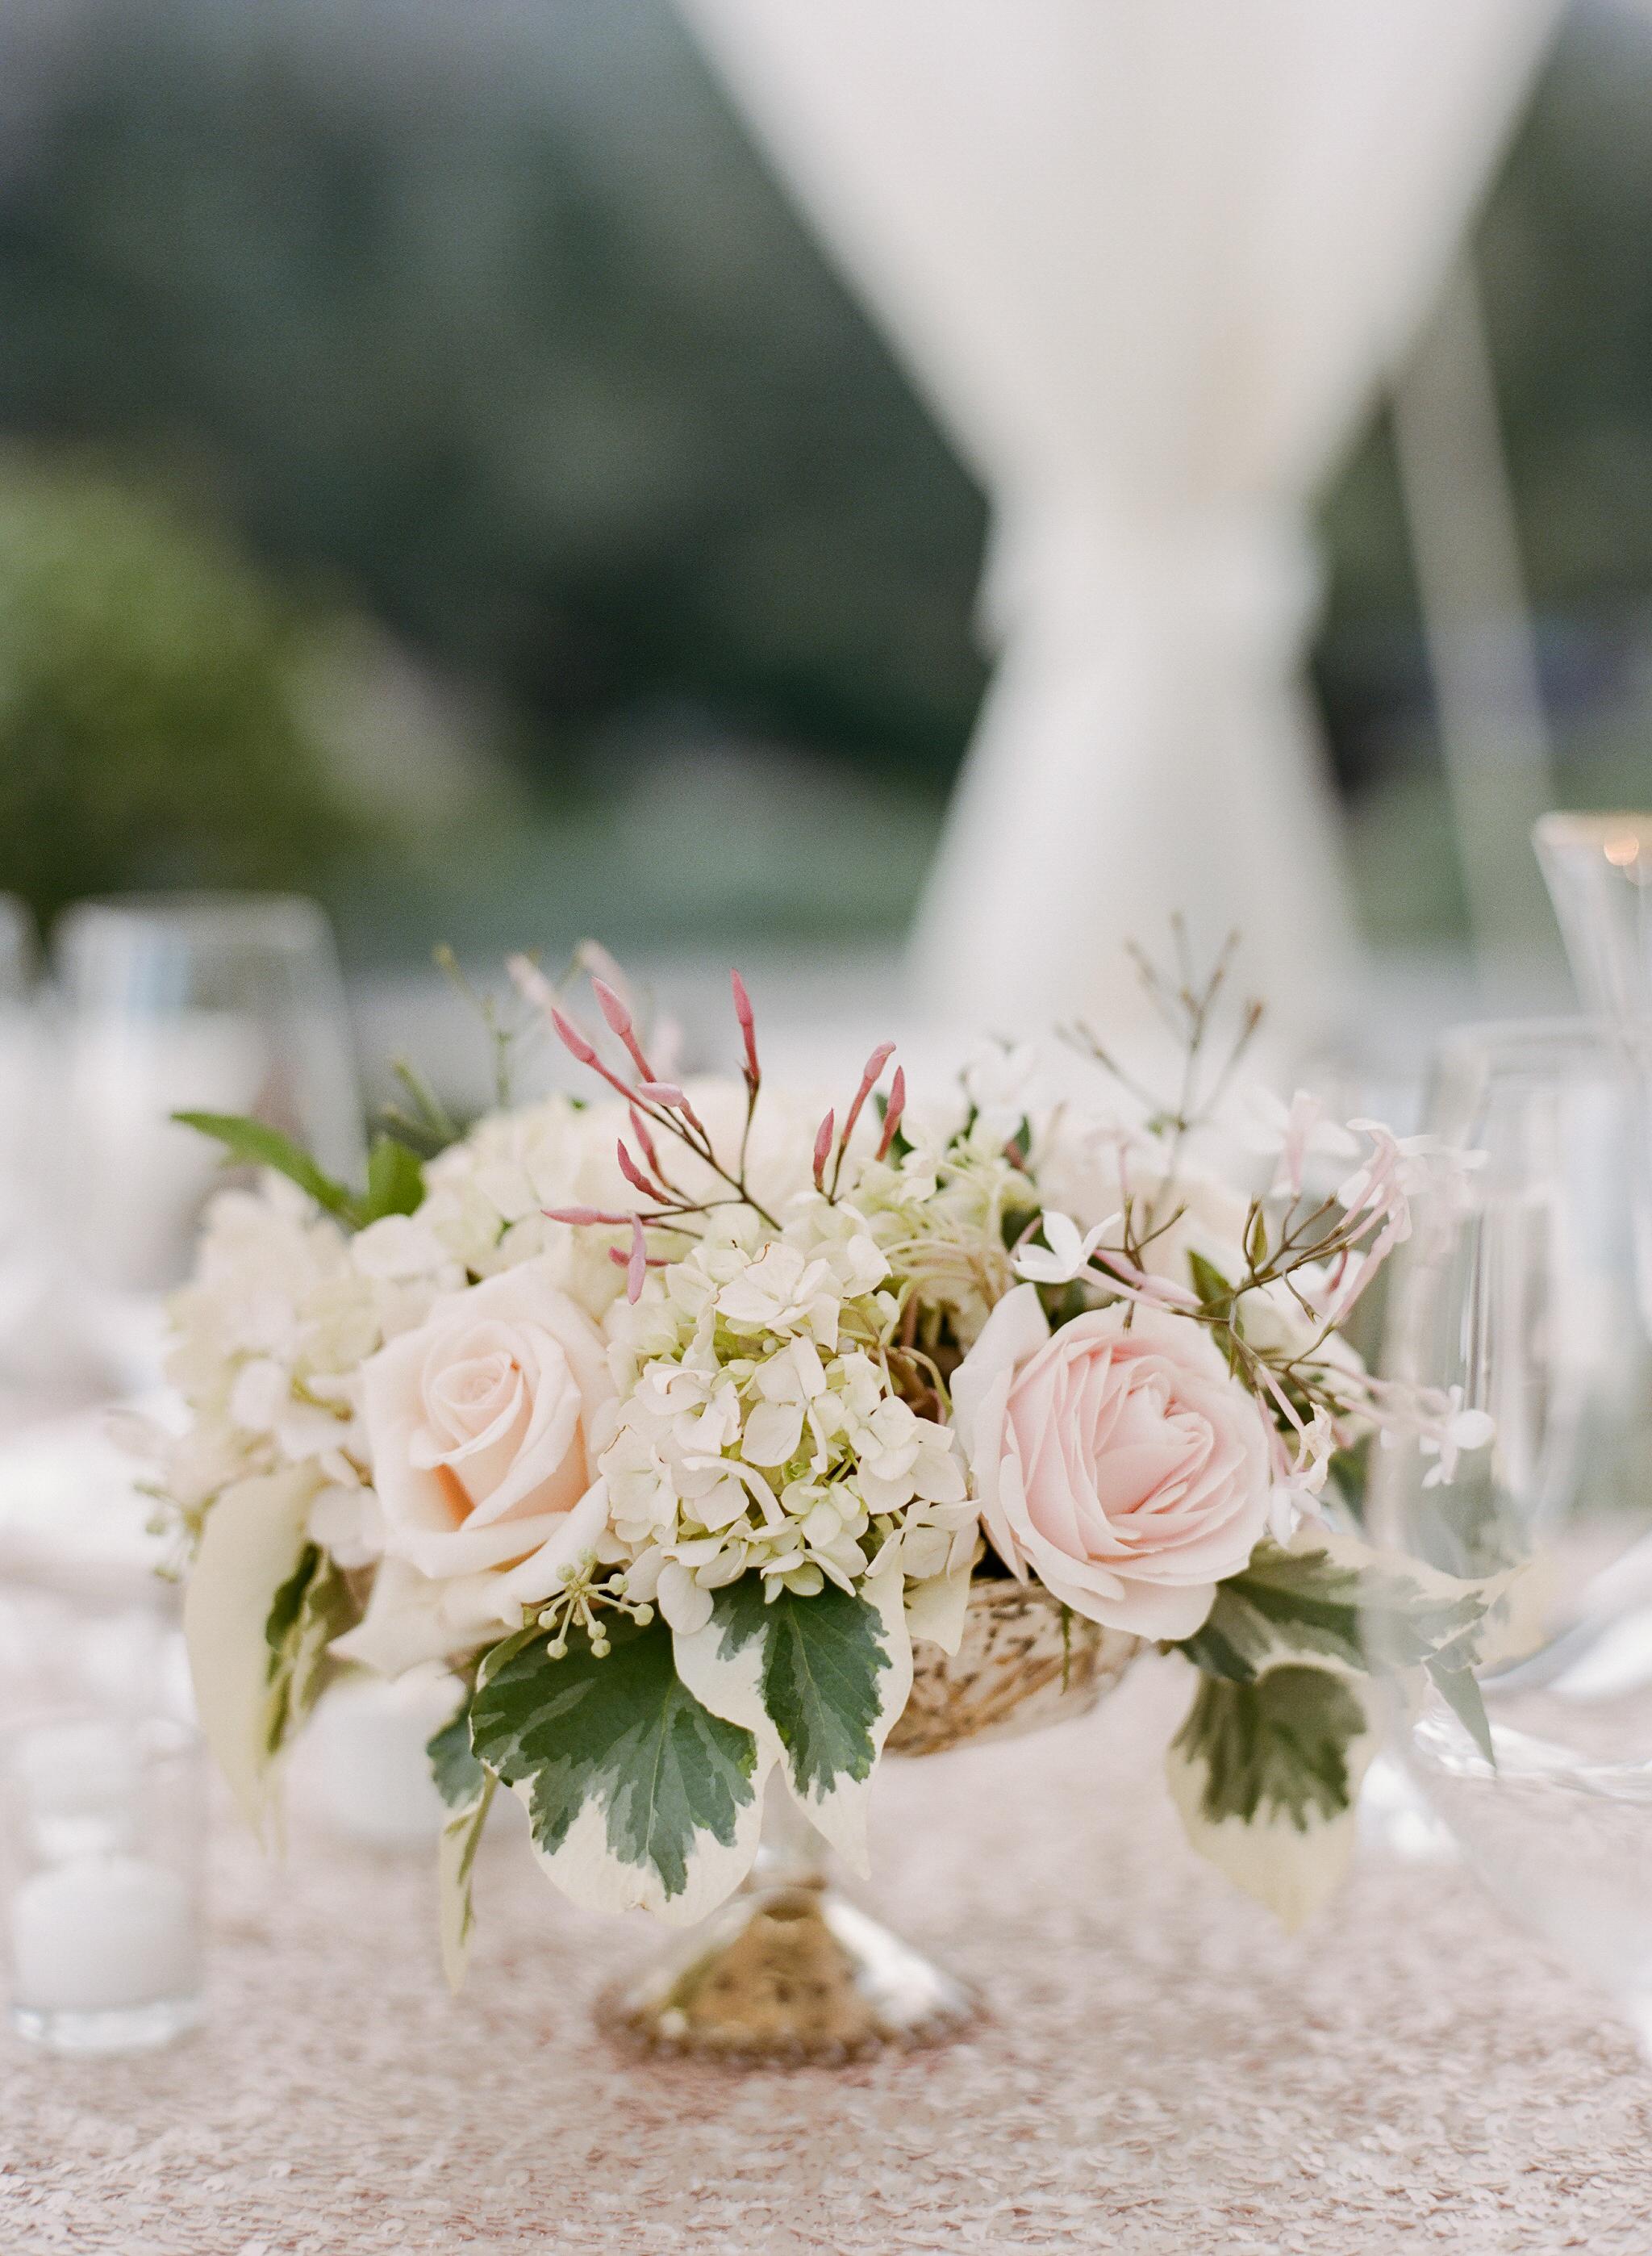 A subtle accent floral arrangement combines hydrangeas with blush roses; photo by Sylvie Gil